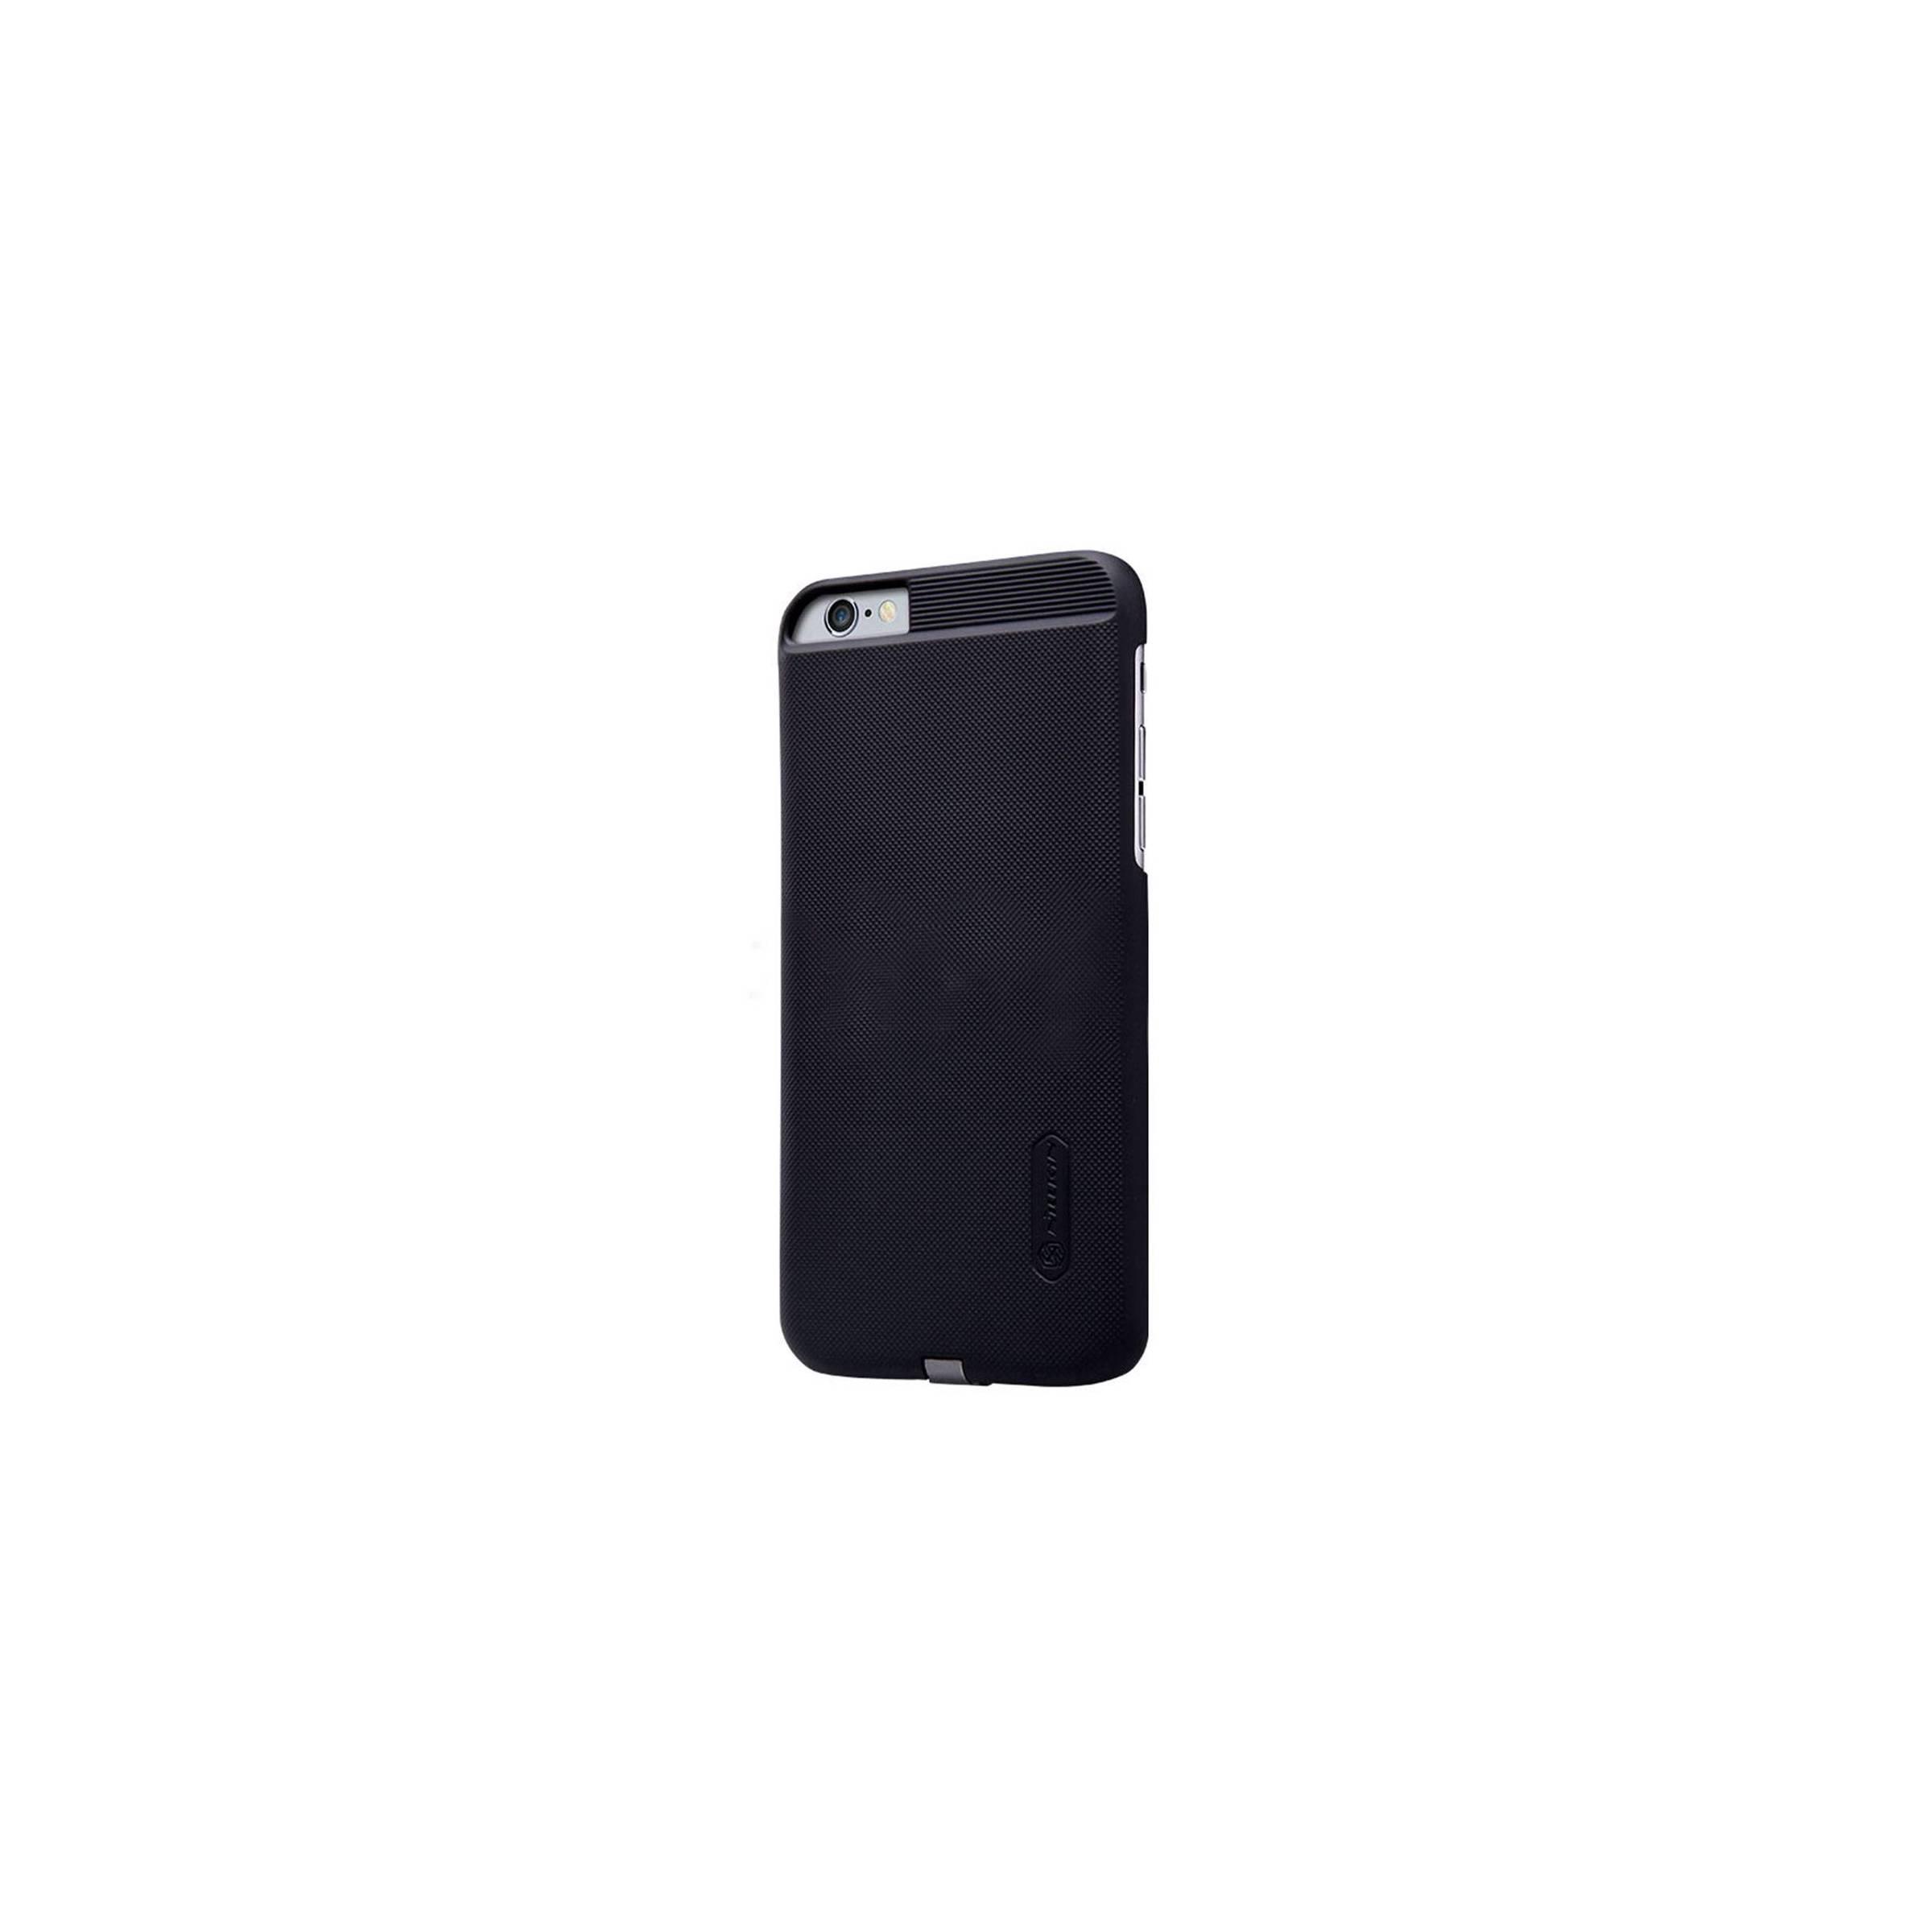 nillkin – Magic cover til qi opladning på iphone iphone iphone 6 plus/ 6s plus fra mackabler.dk